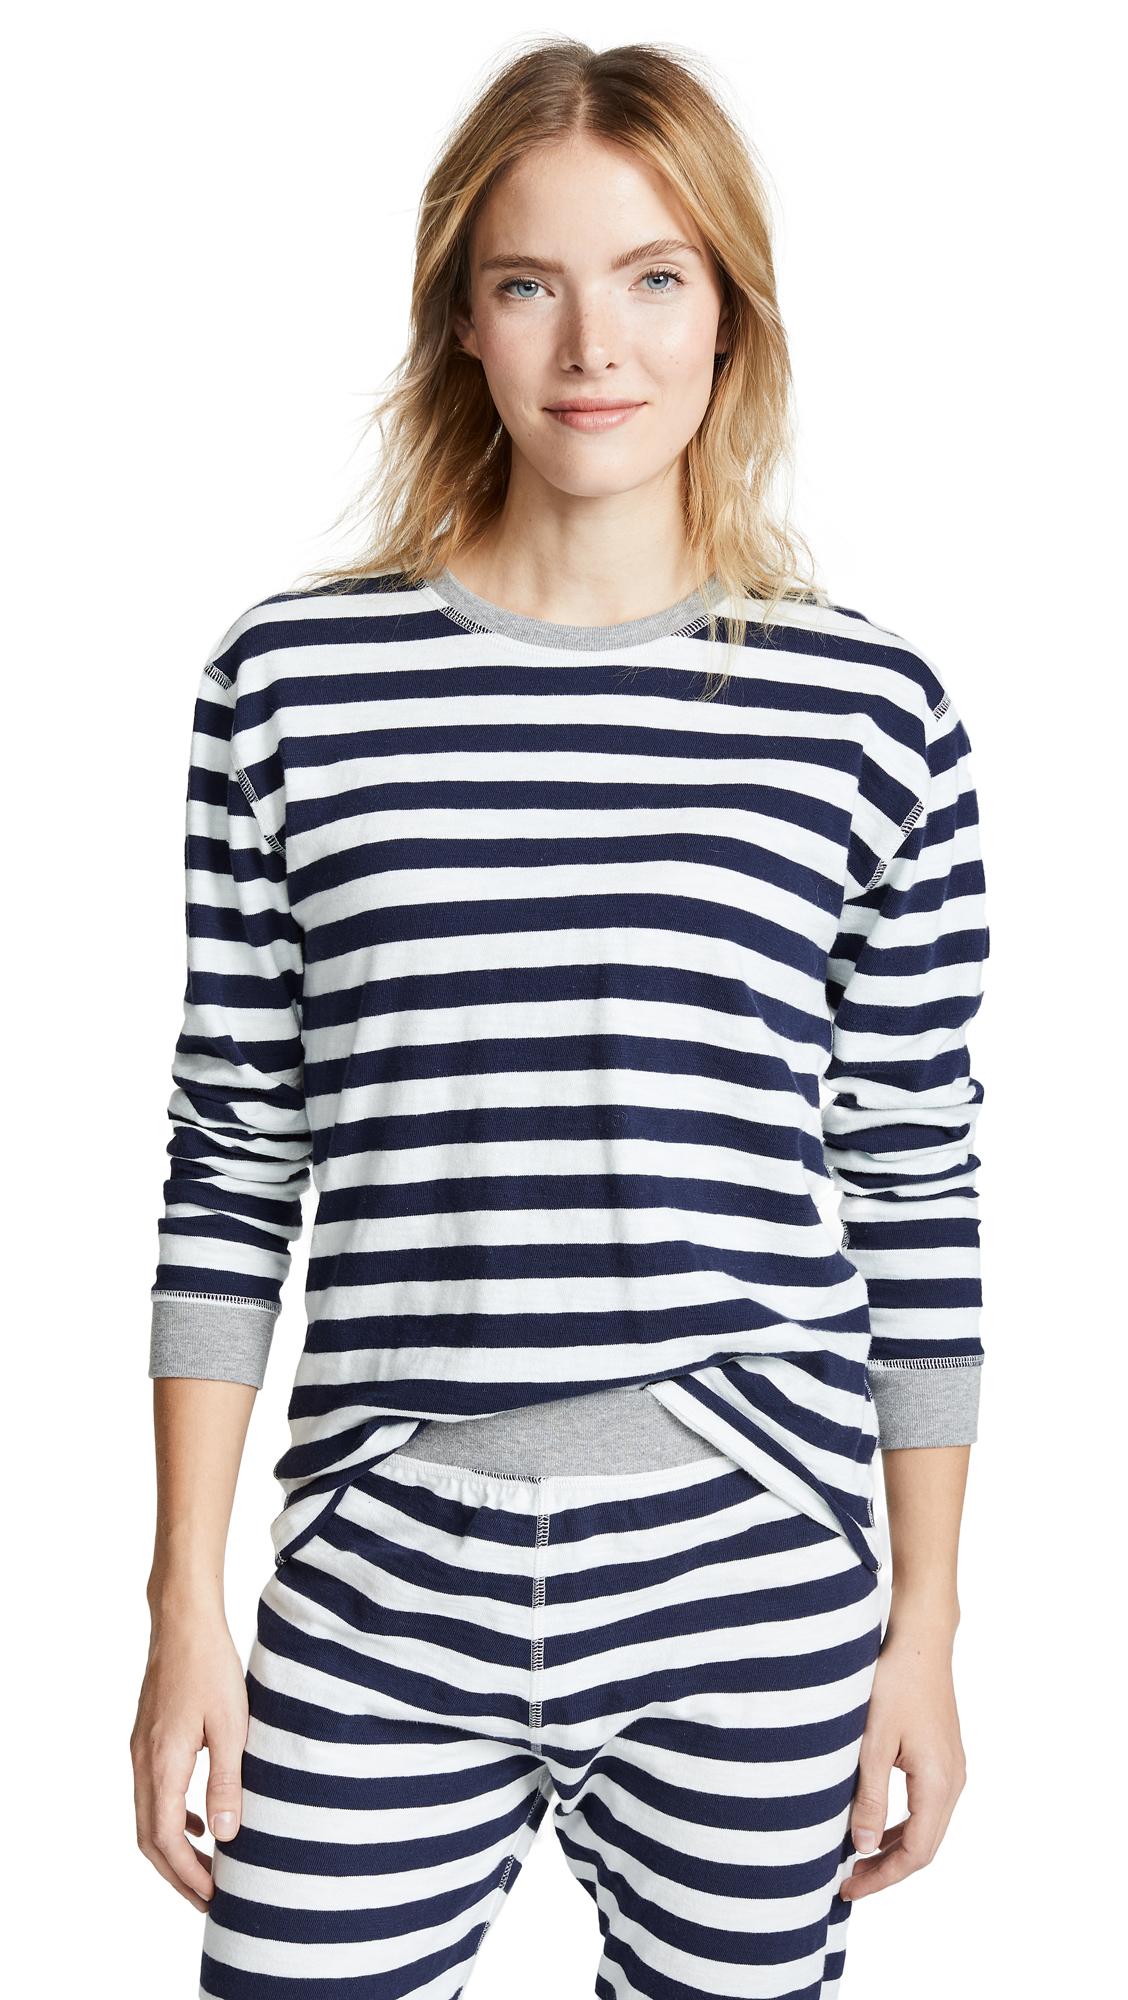 SLEEPY JONES Helen Long Sleeve Shirt in Medium Stripe Navy